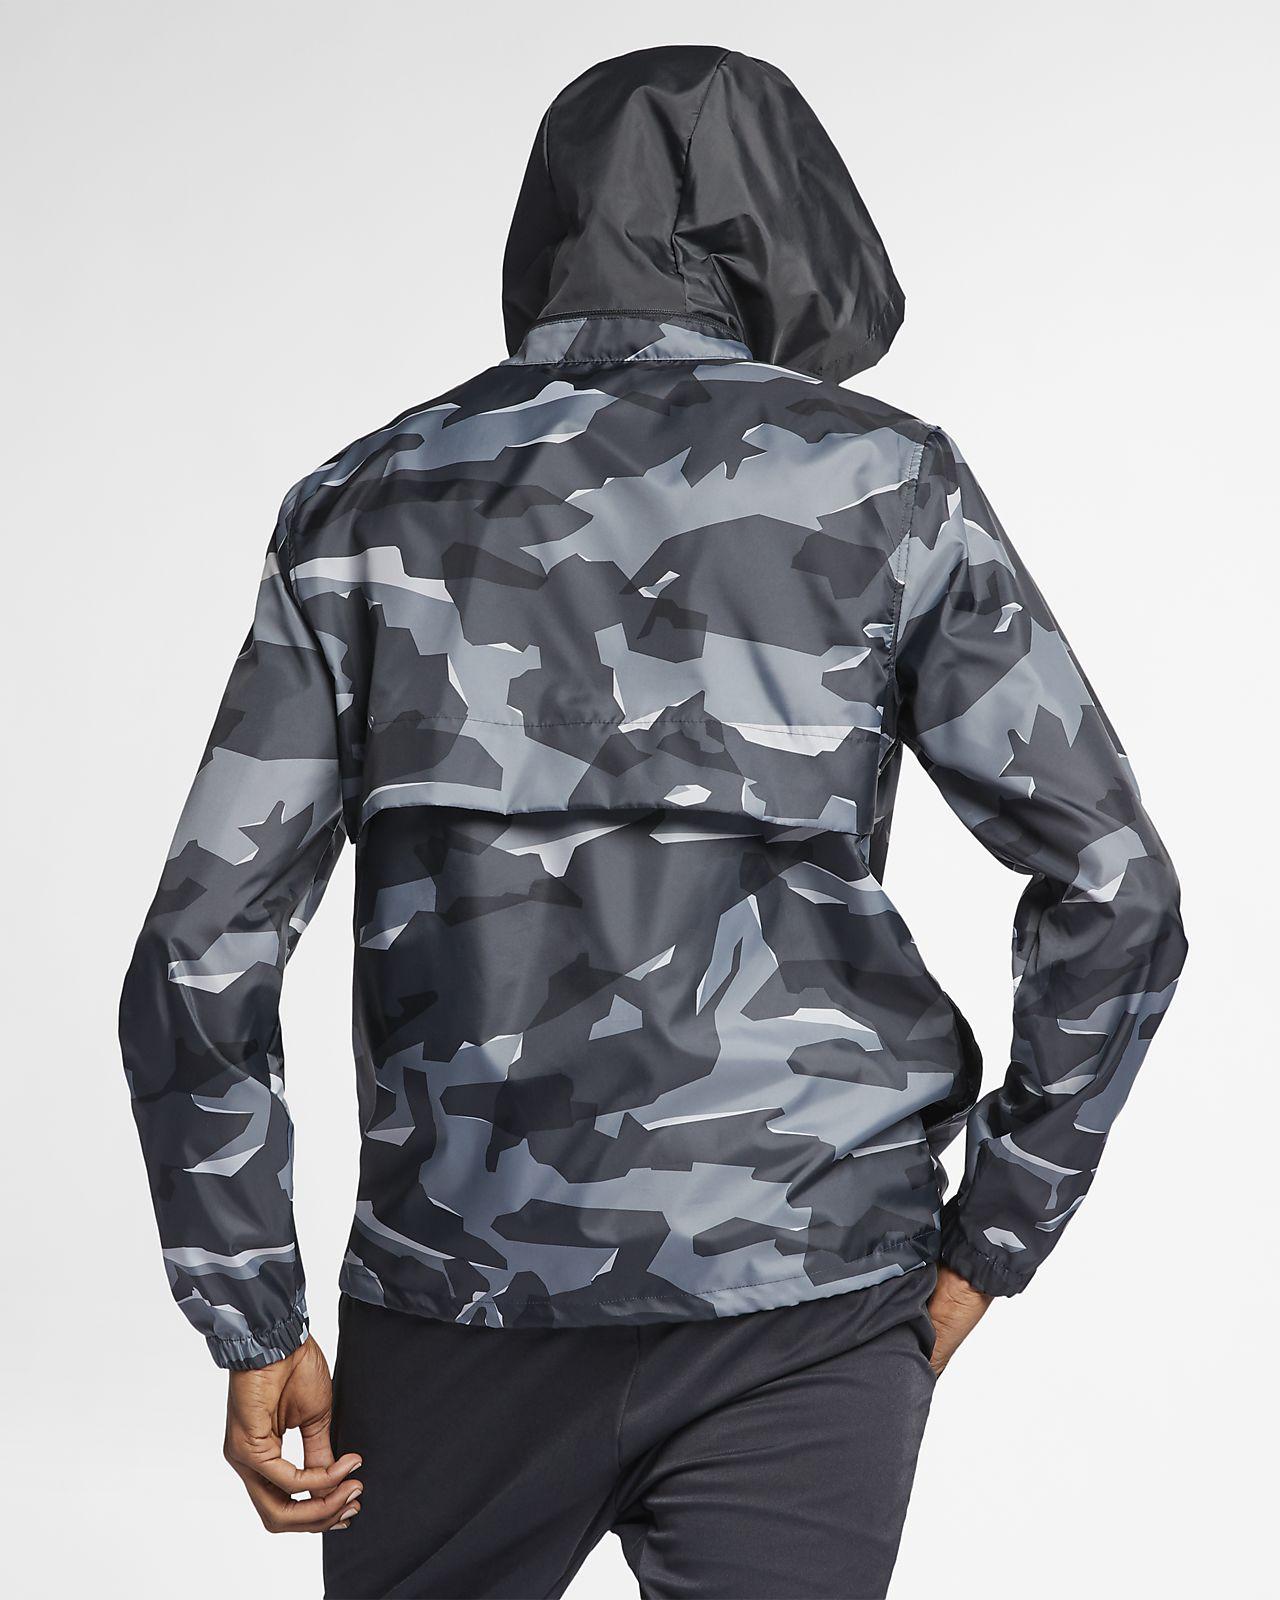 Nike Hombre De Camuflaje Chaqueta Wnzneya8 Sportswear Es Capucha Con 1ZEqSR